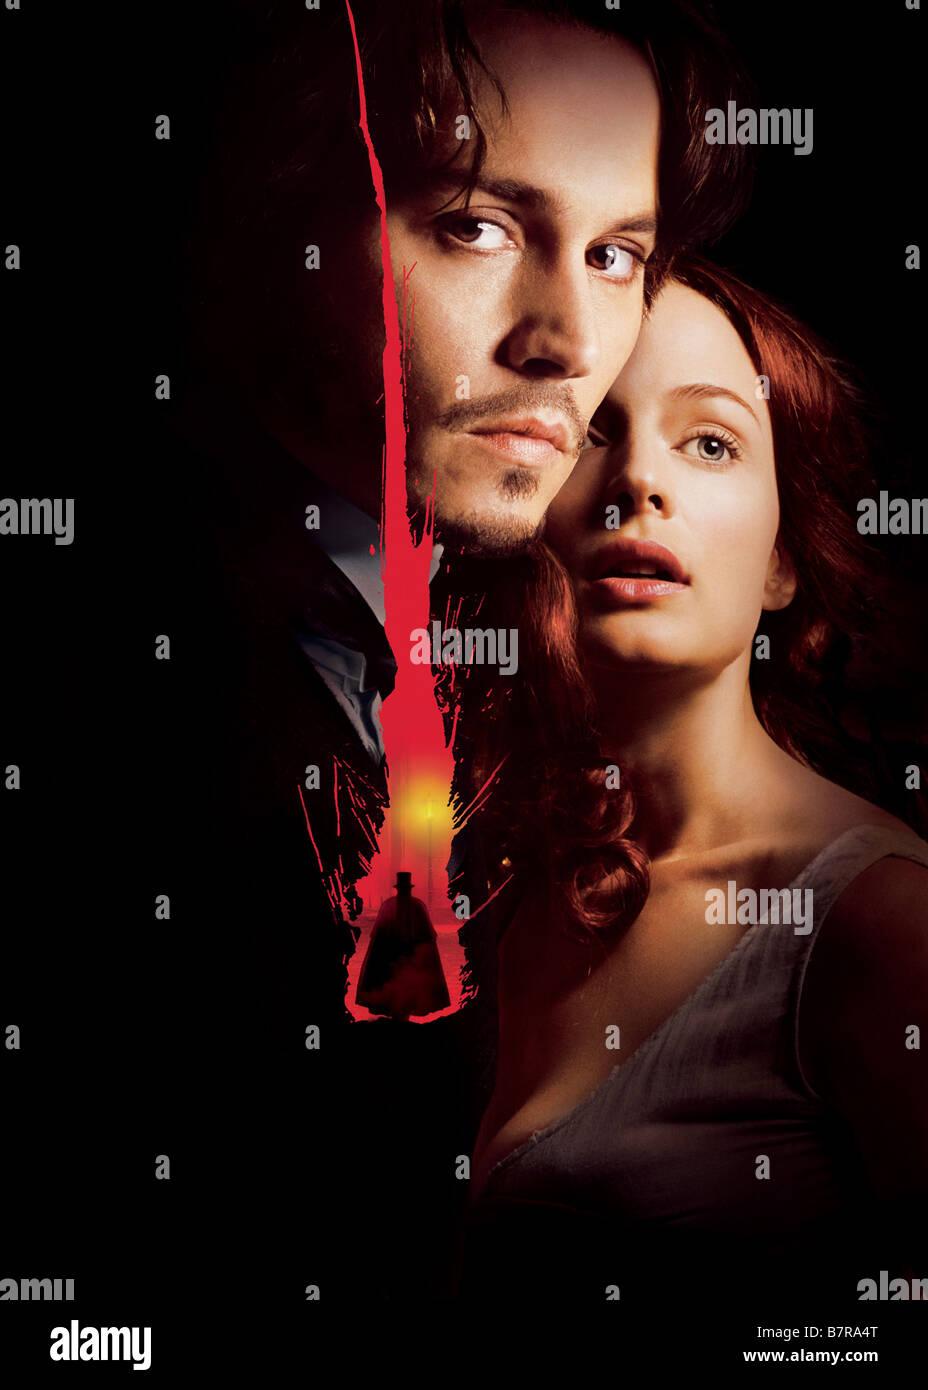 From Hell Year: 2001 USA / UK Johnny Depp, Heather Graham  Director: Albert Hughes  Allen Hughes Art Work - Stock Image